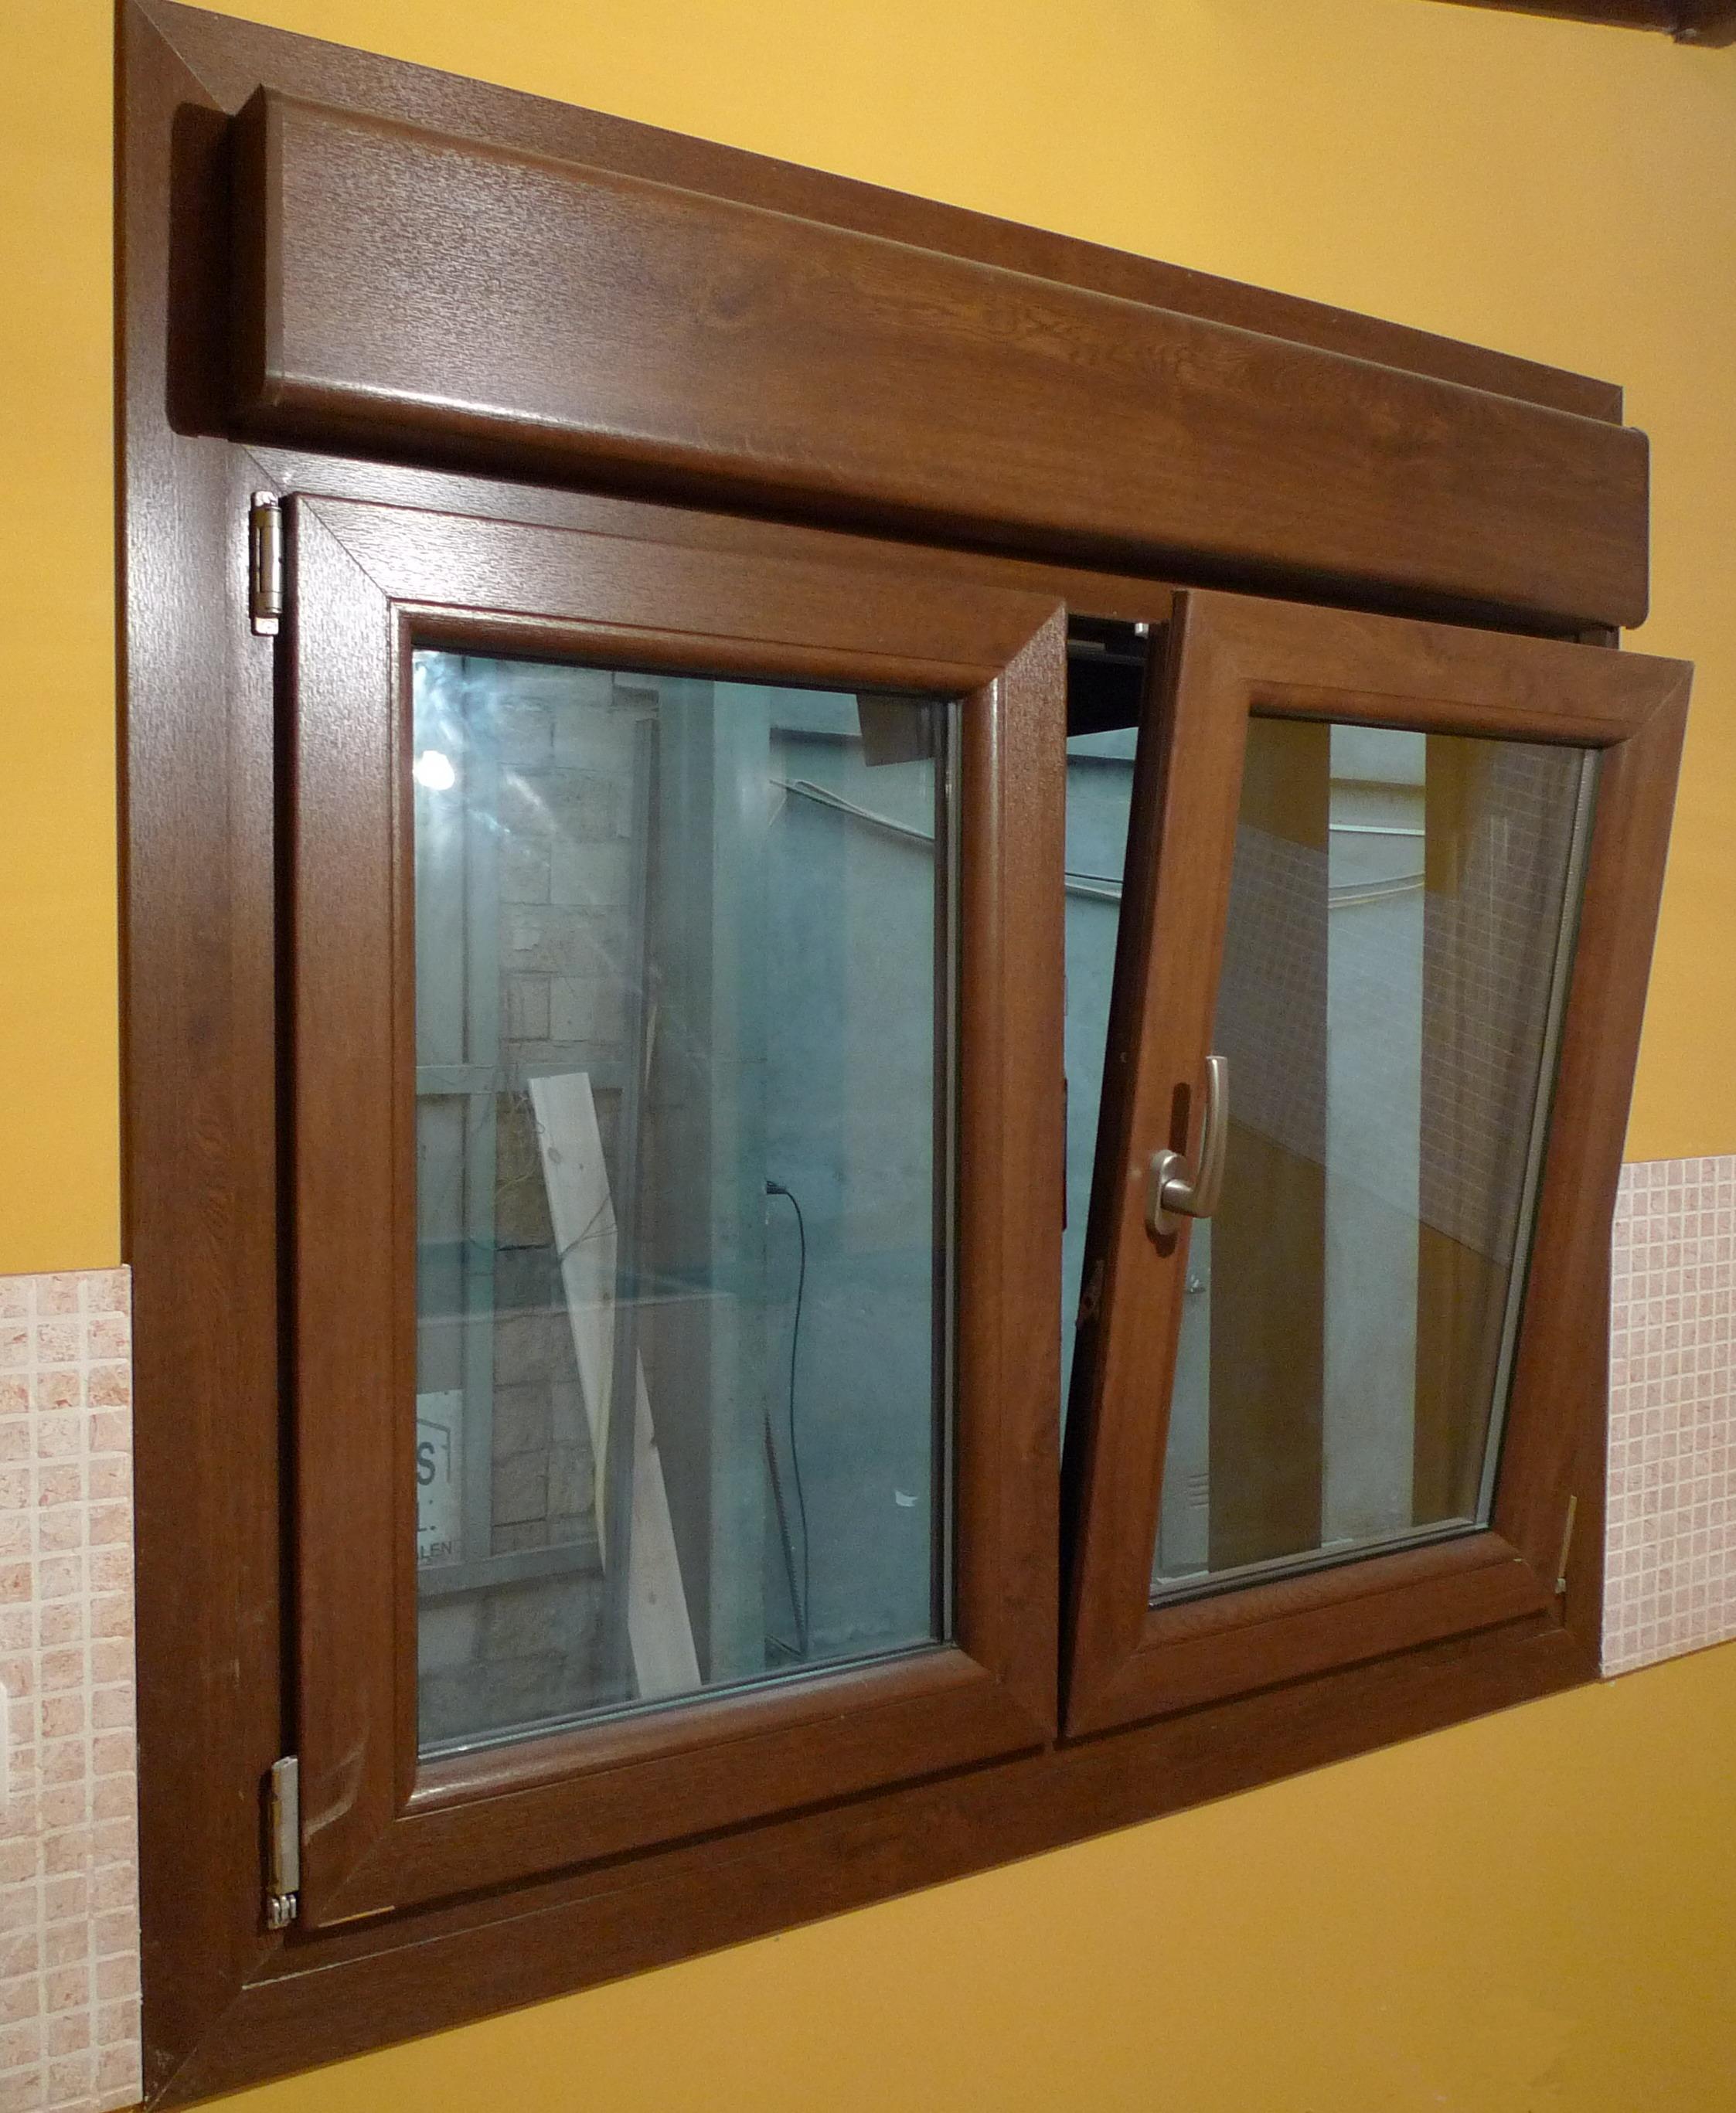 Ventanas y puertas de pvc frampe - Precios ventanas pvc climalit ...